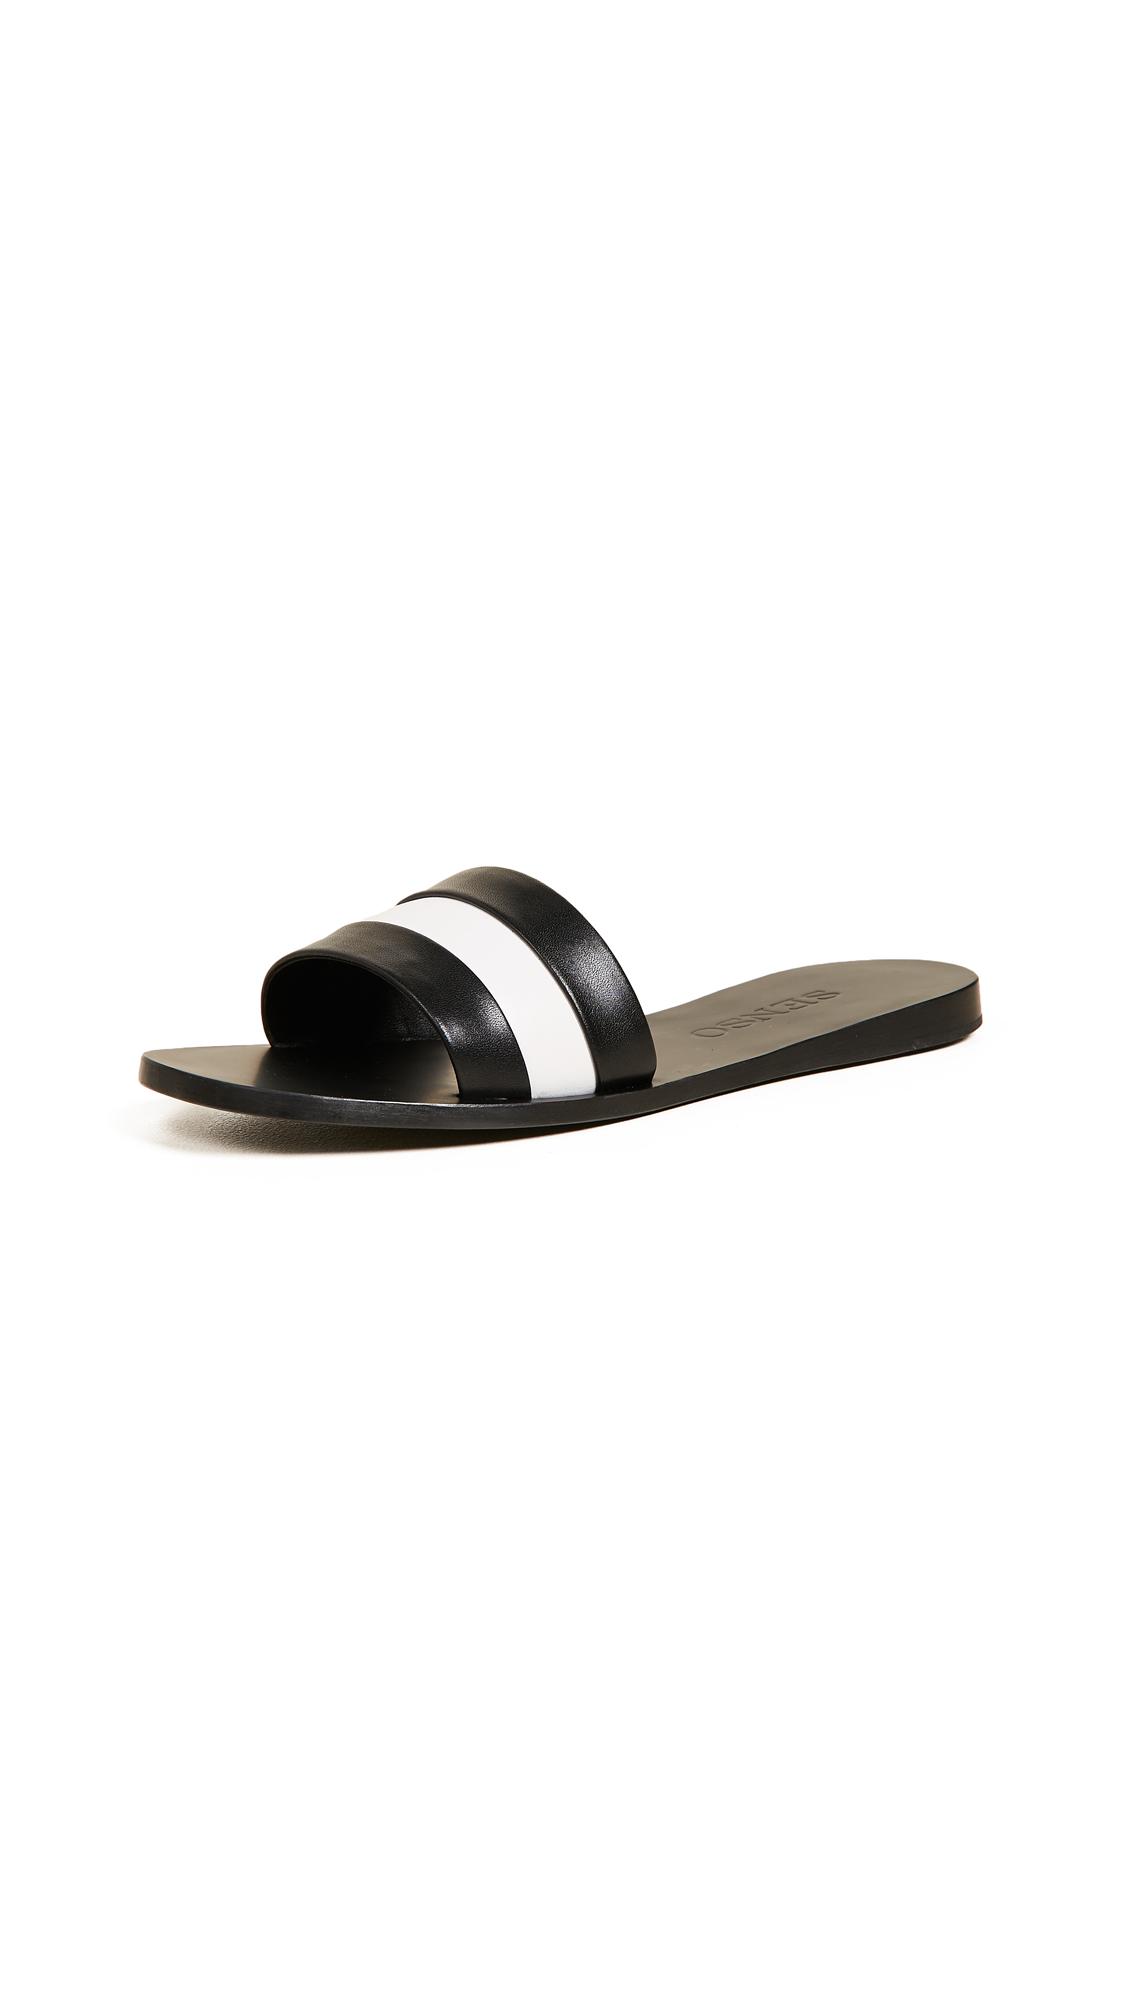 SENSO Bec Slides - Ebony